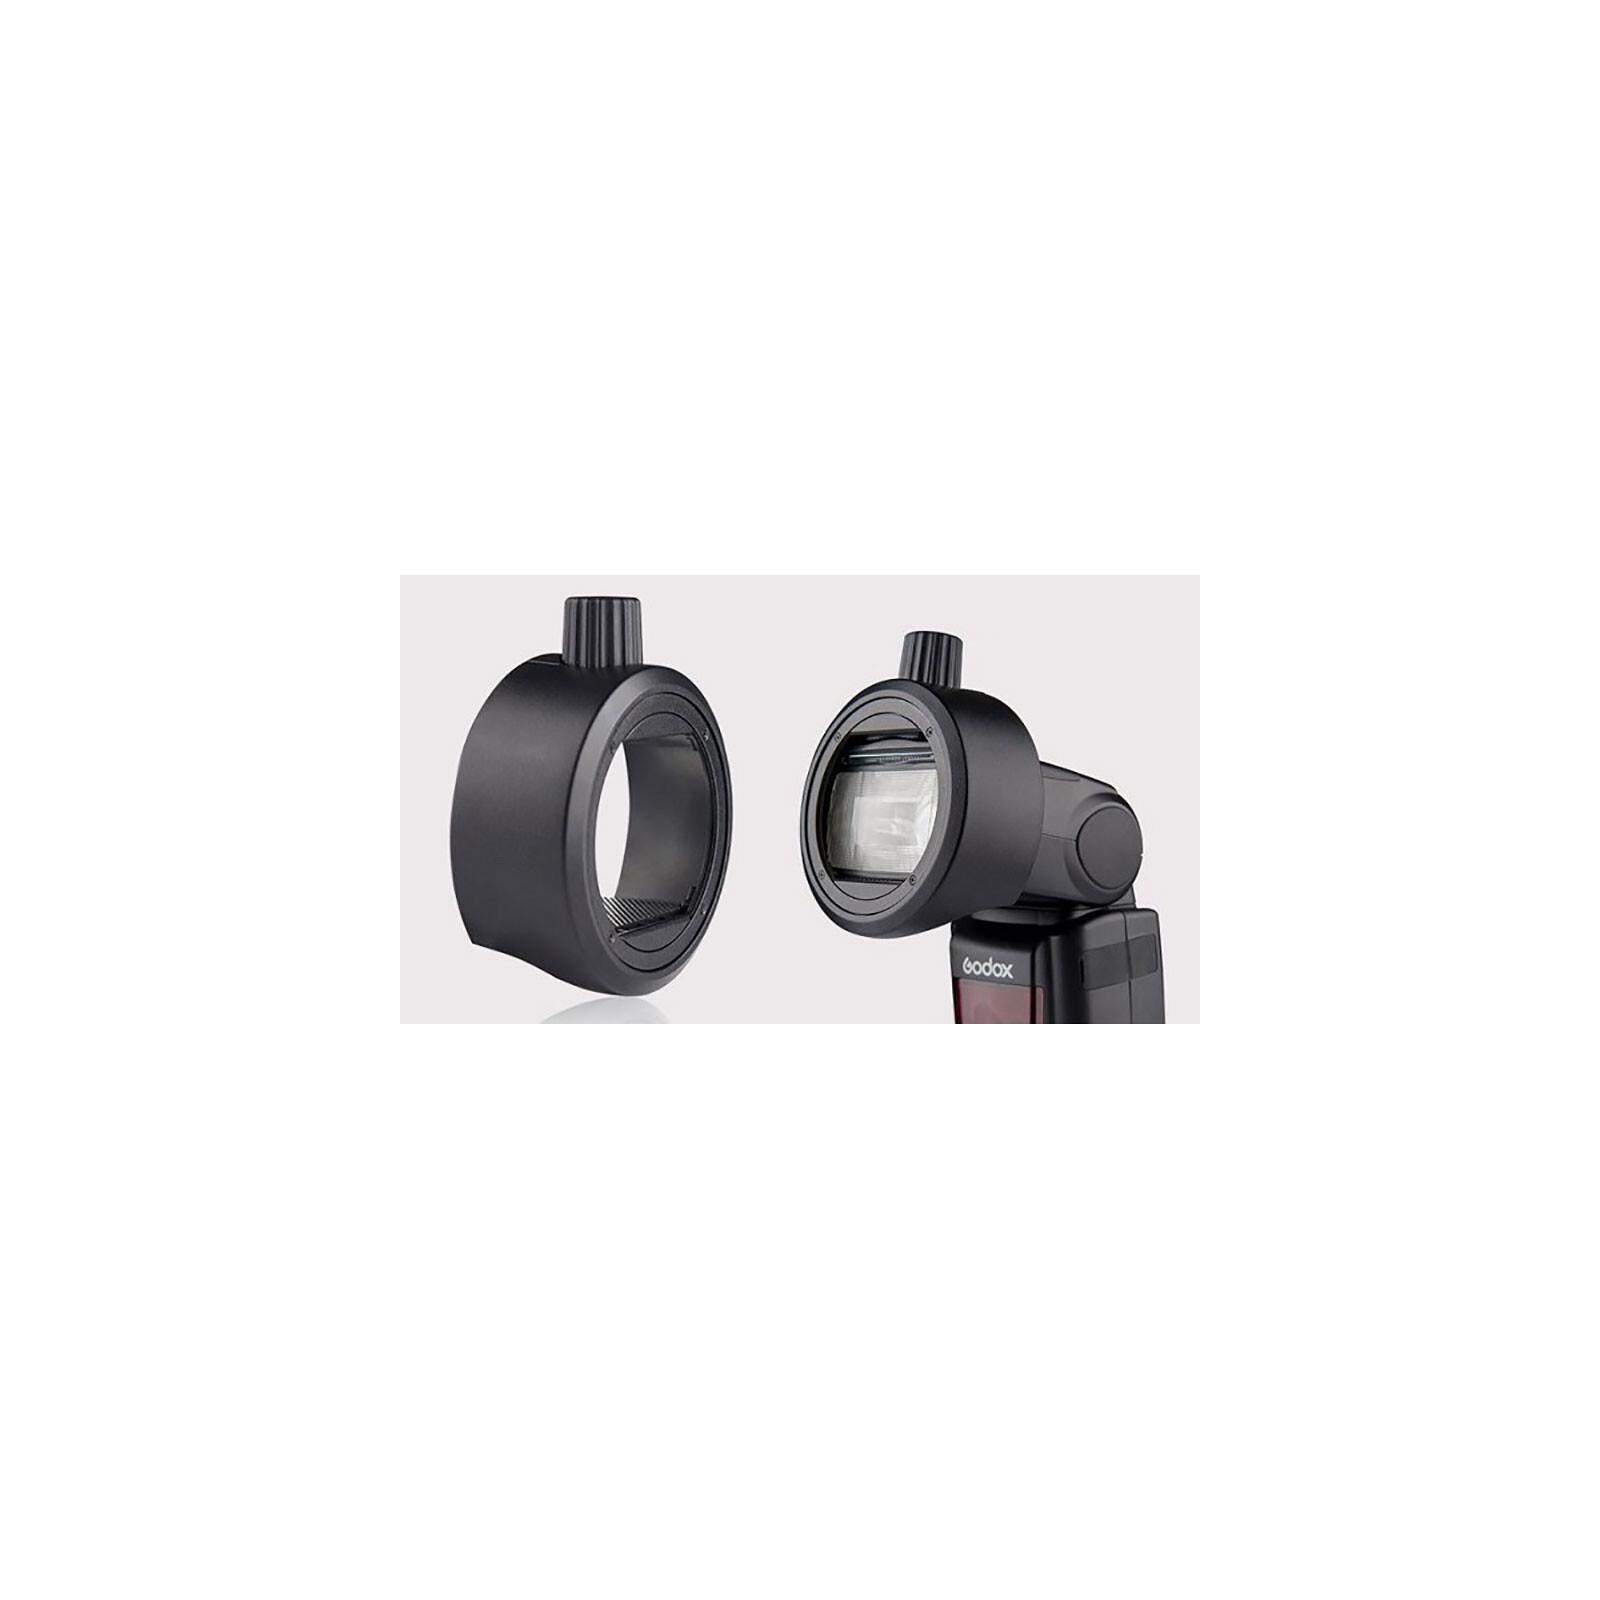 GODOX SR1 Round Head Speedlight Adapter